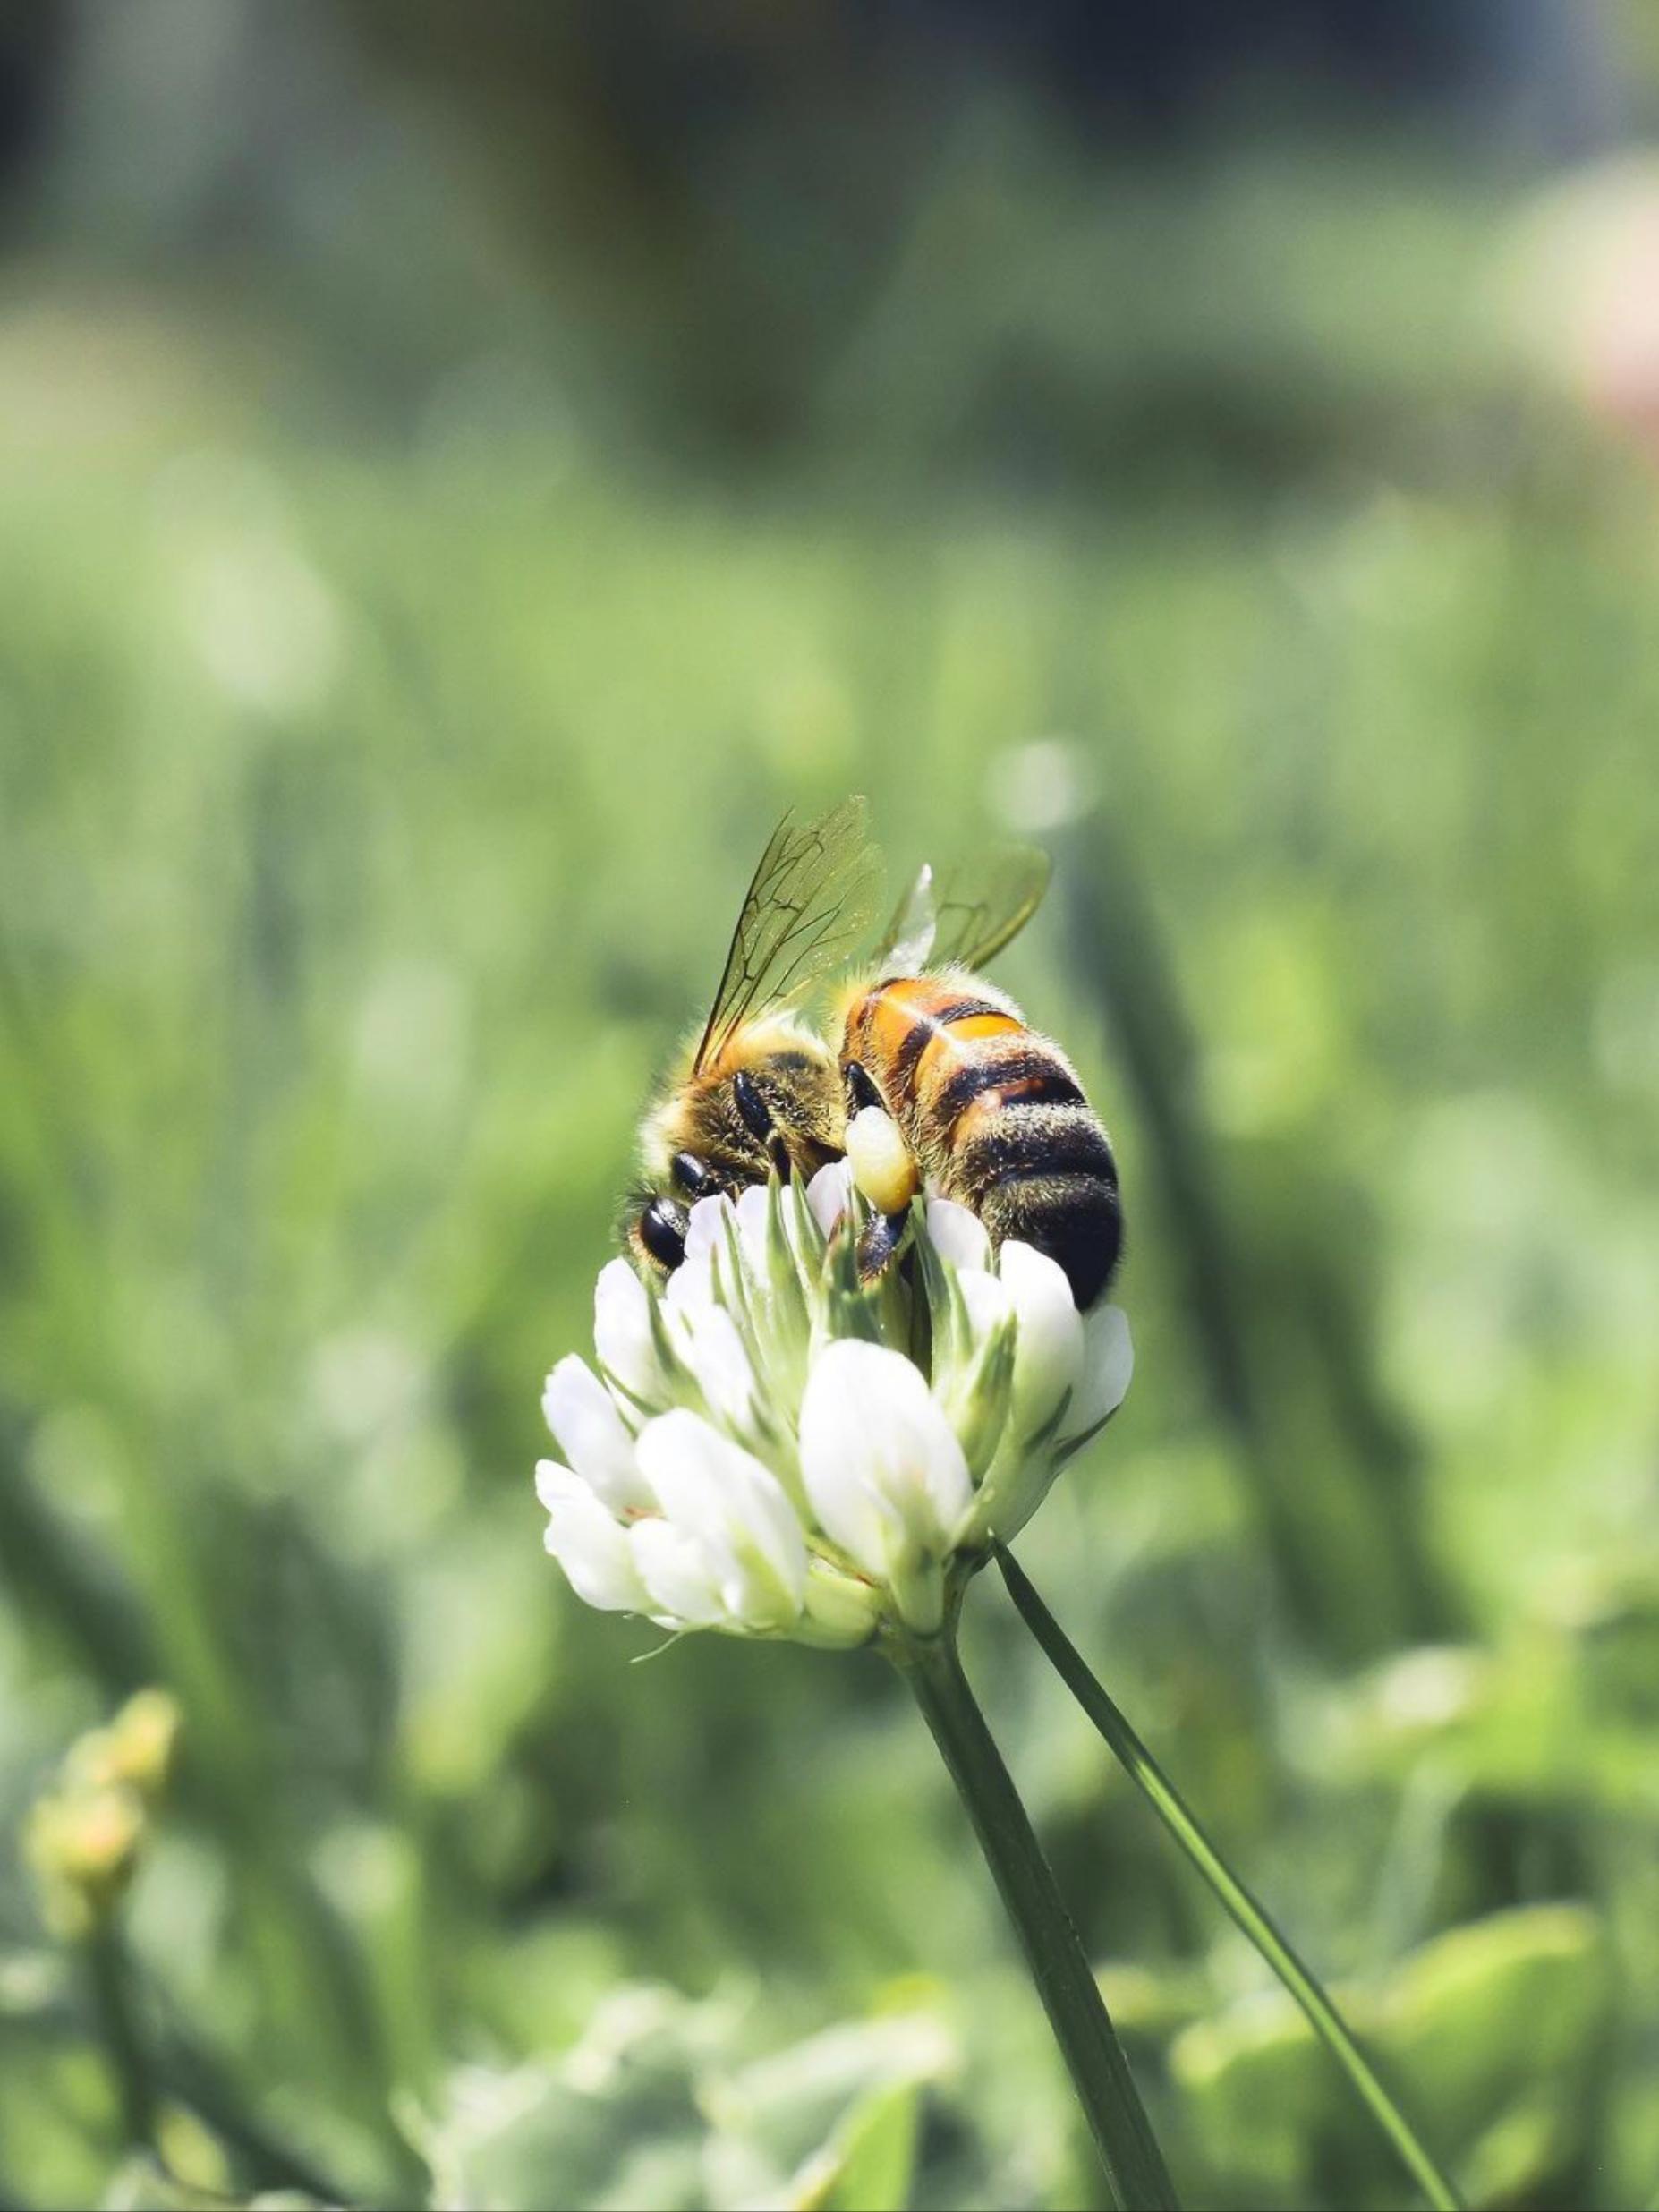 Honeybees on a flower